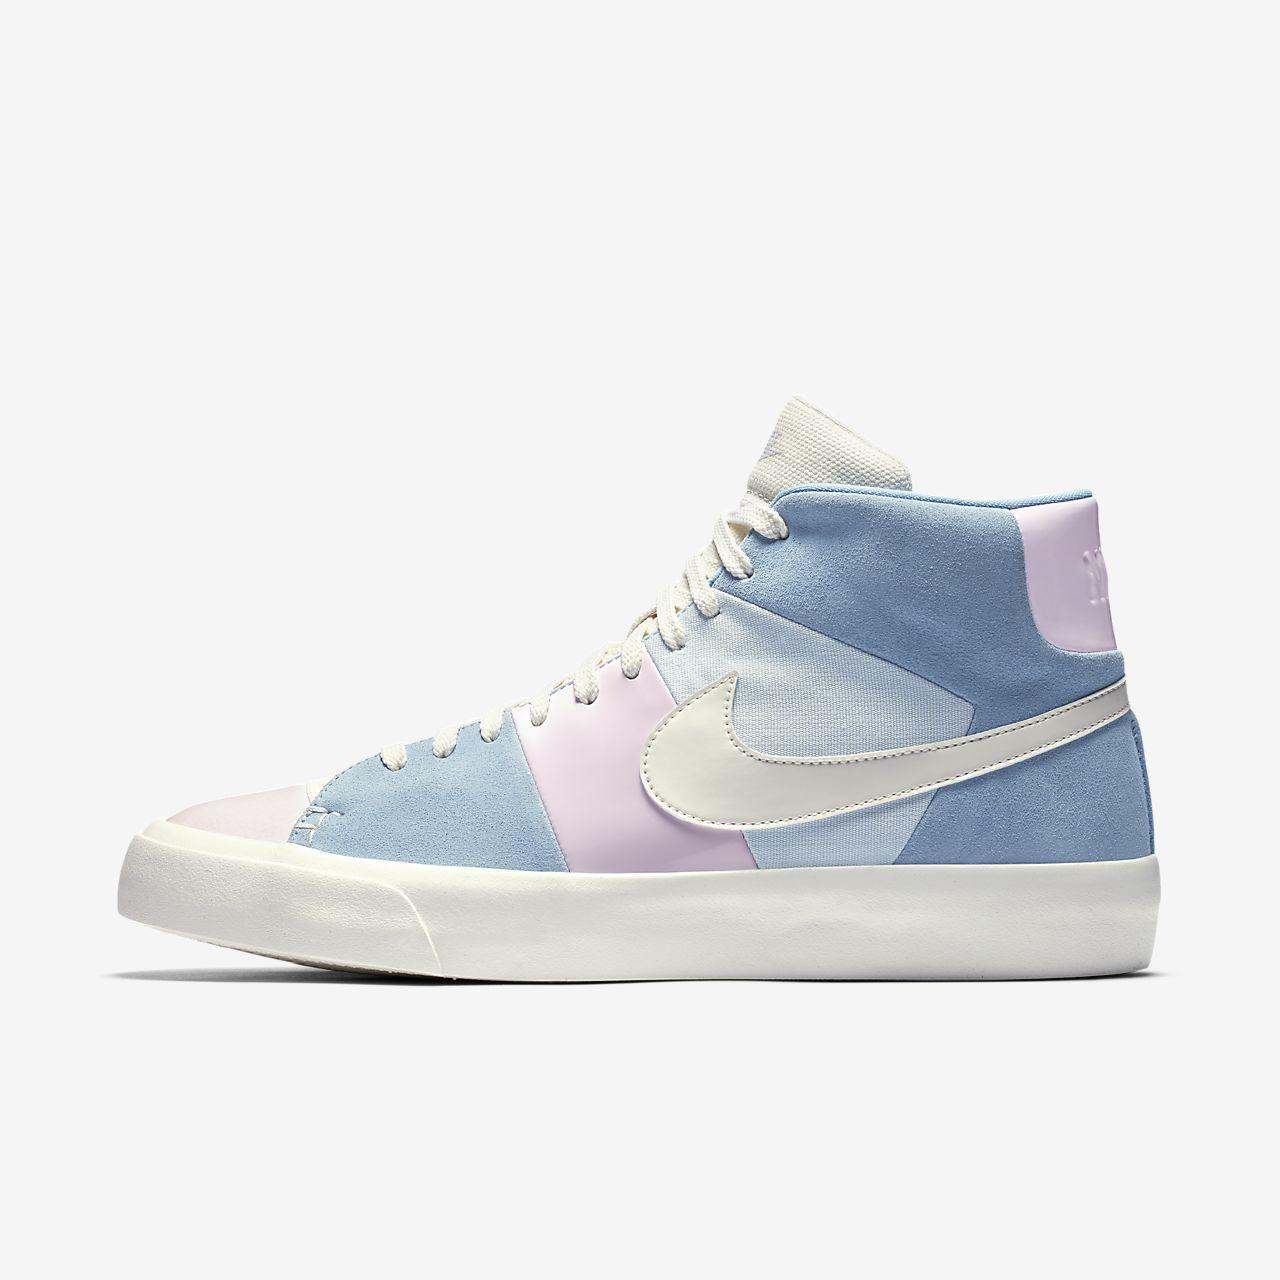 cheap for discount 7f3ee 7cbfa ... Buty męskie Nike Blazer Royal Easter QS